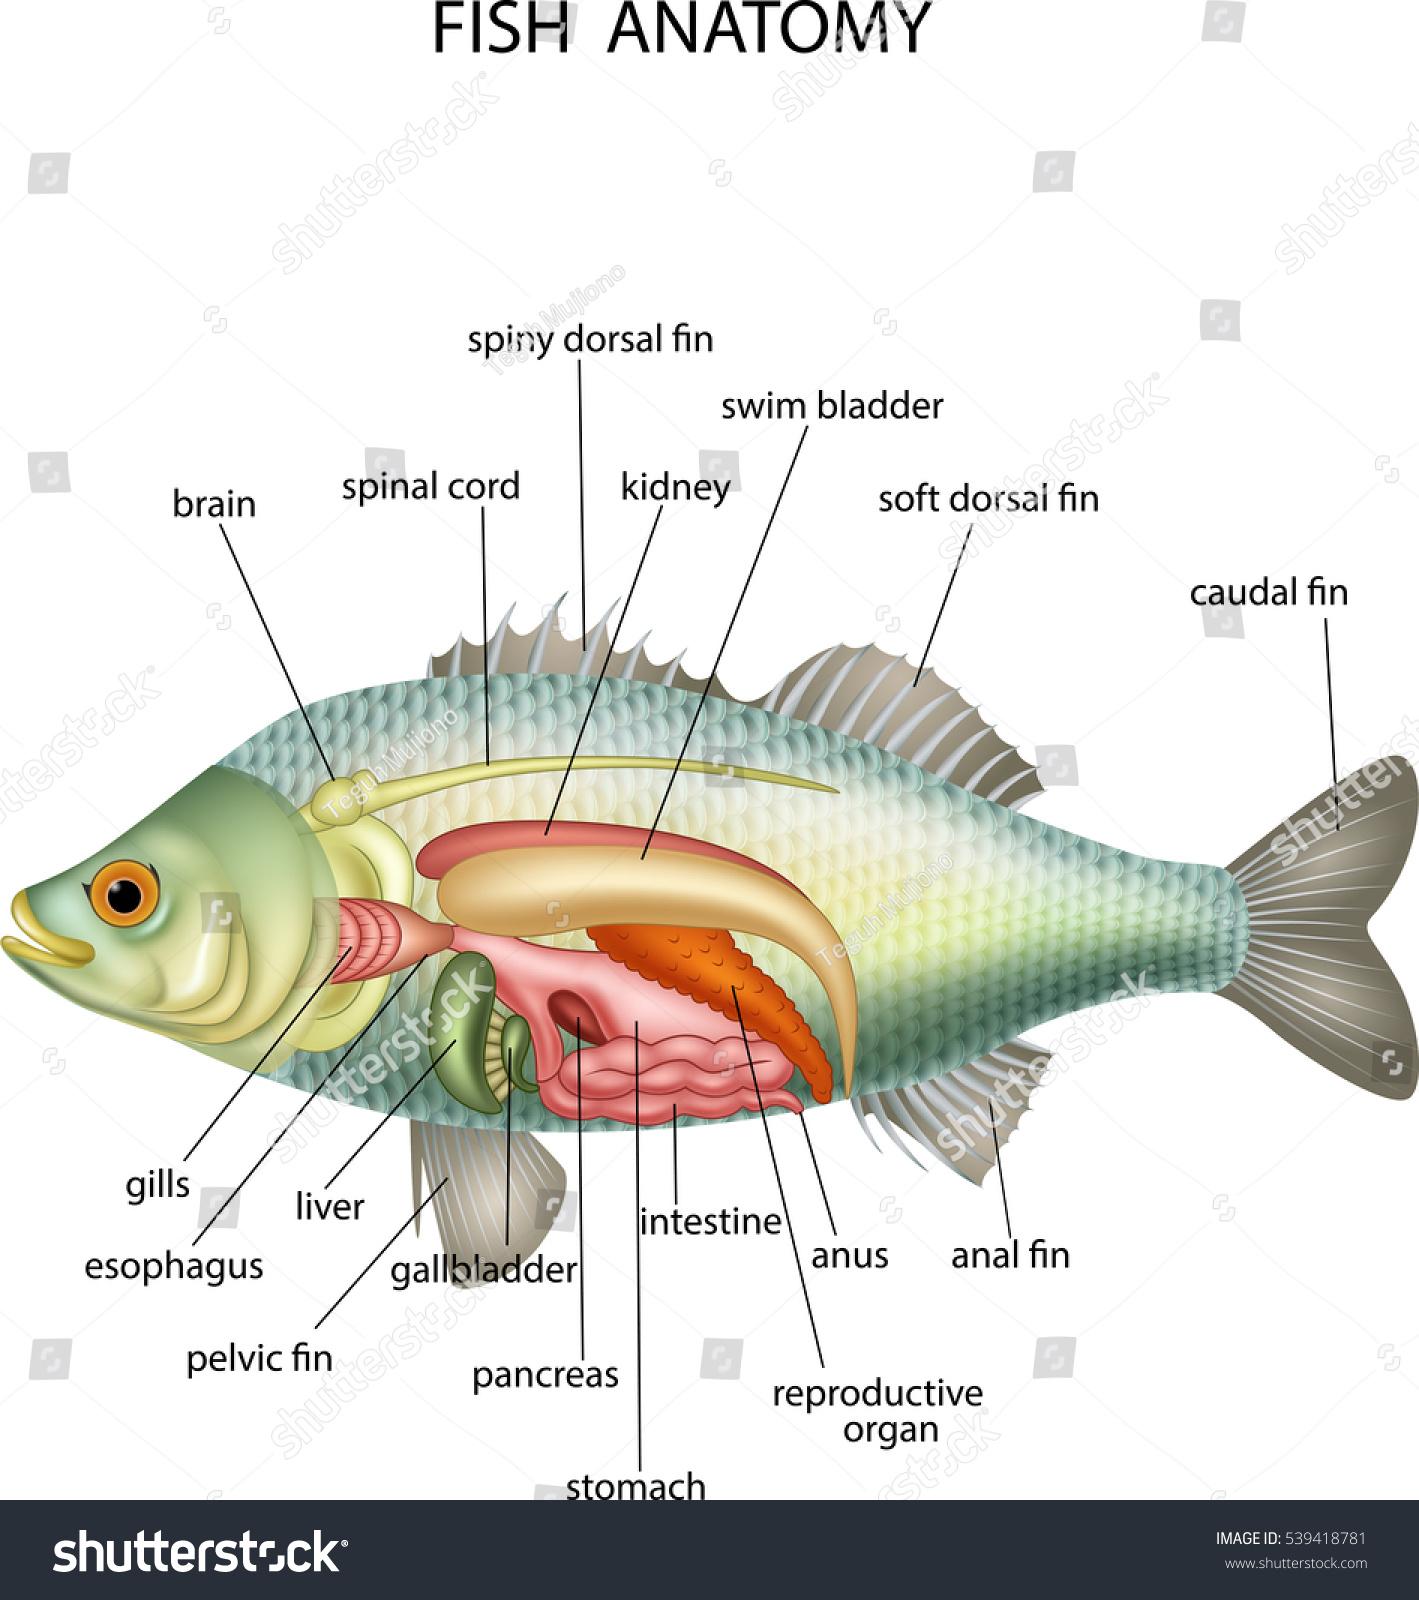 worksheet. Fish Anatomy Worksheet. Worksheet Fun Worksheet Study Site